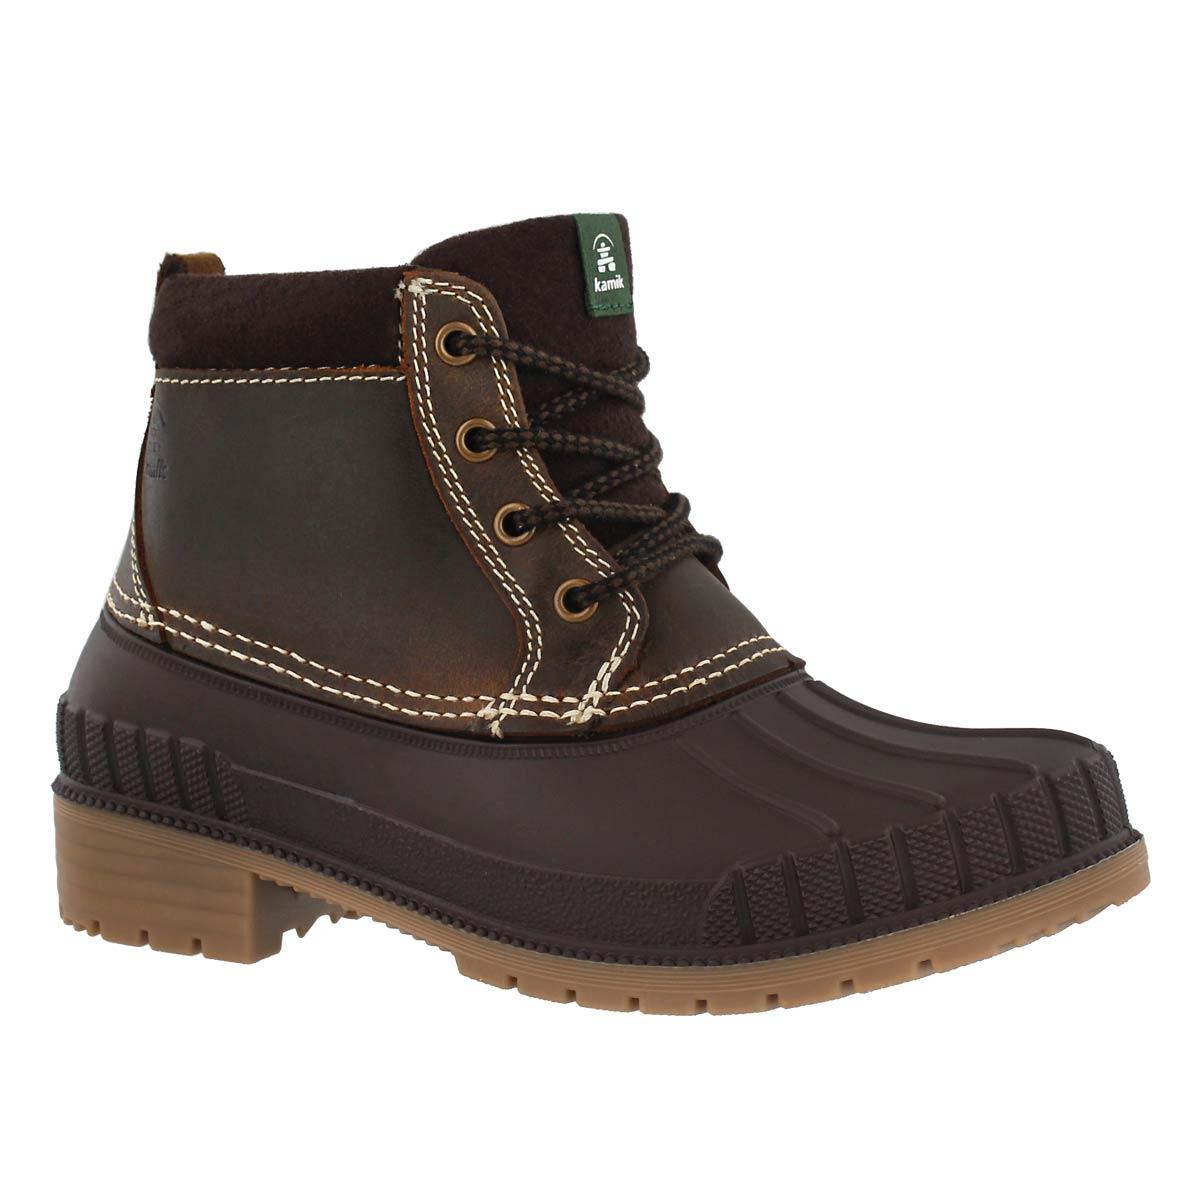 Lds Evelyn4 dk brn wtpf low rain boot